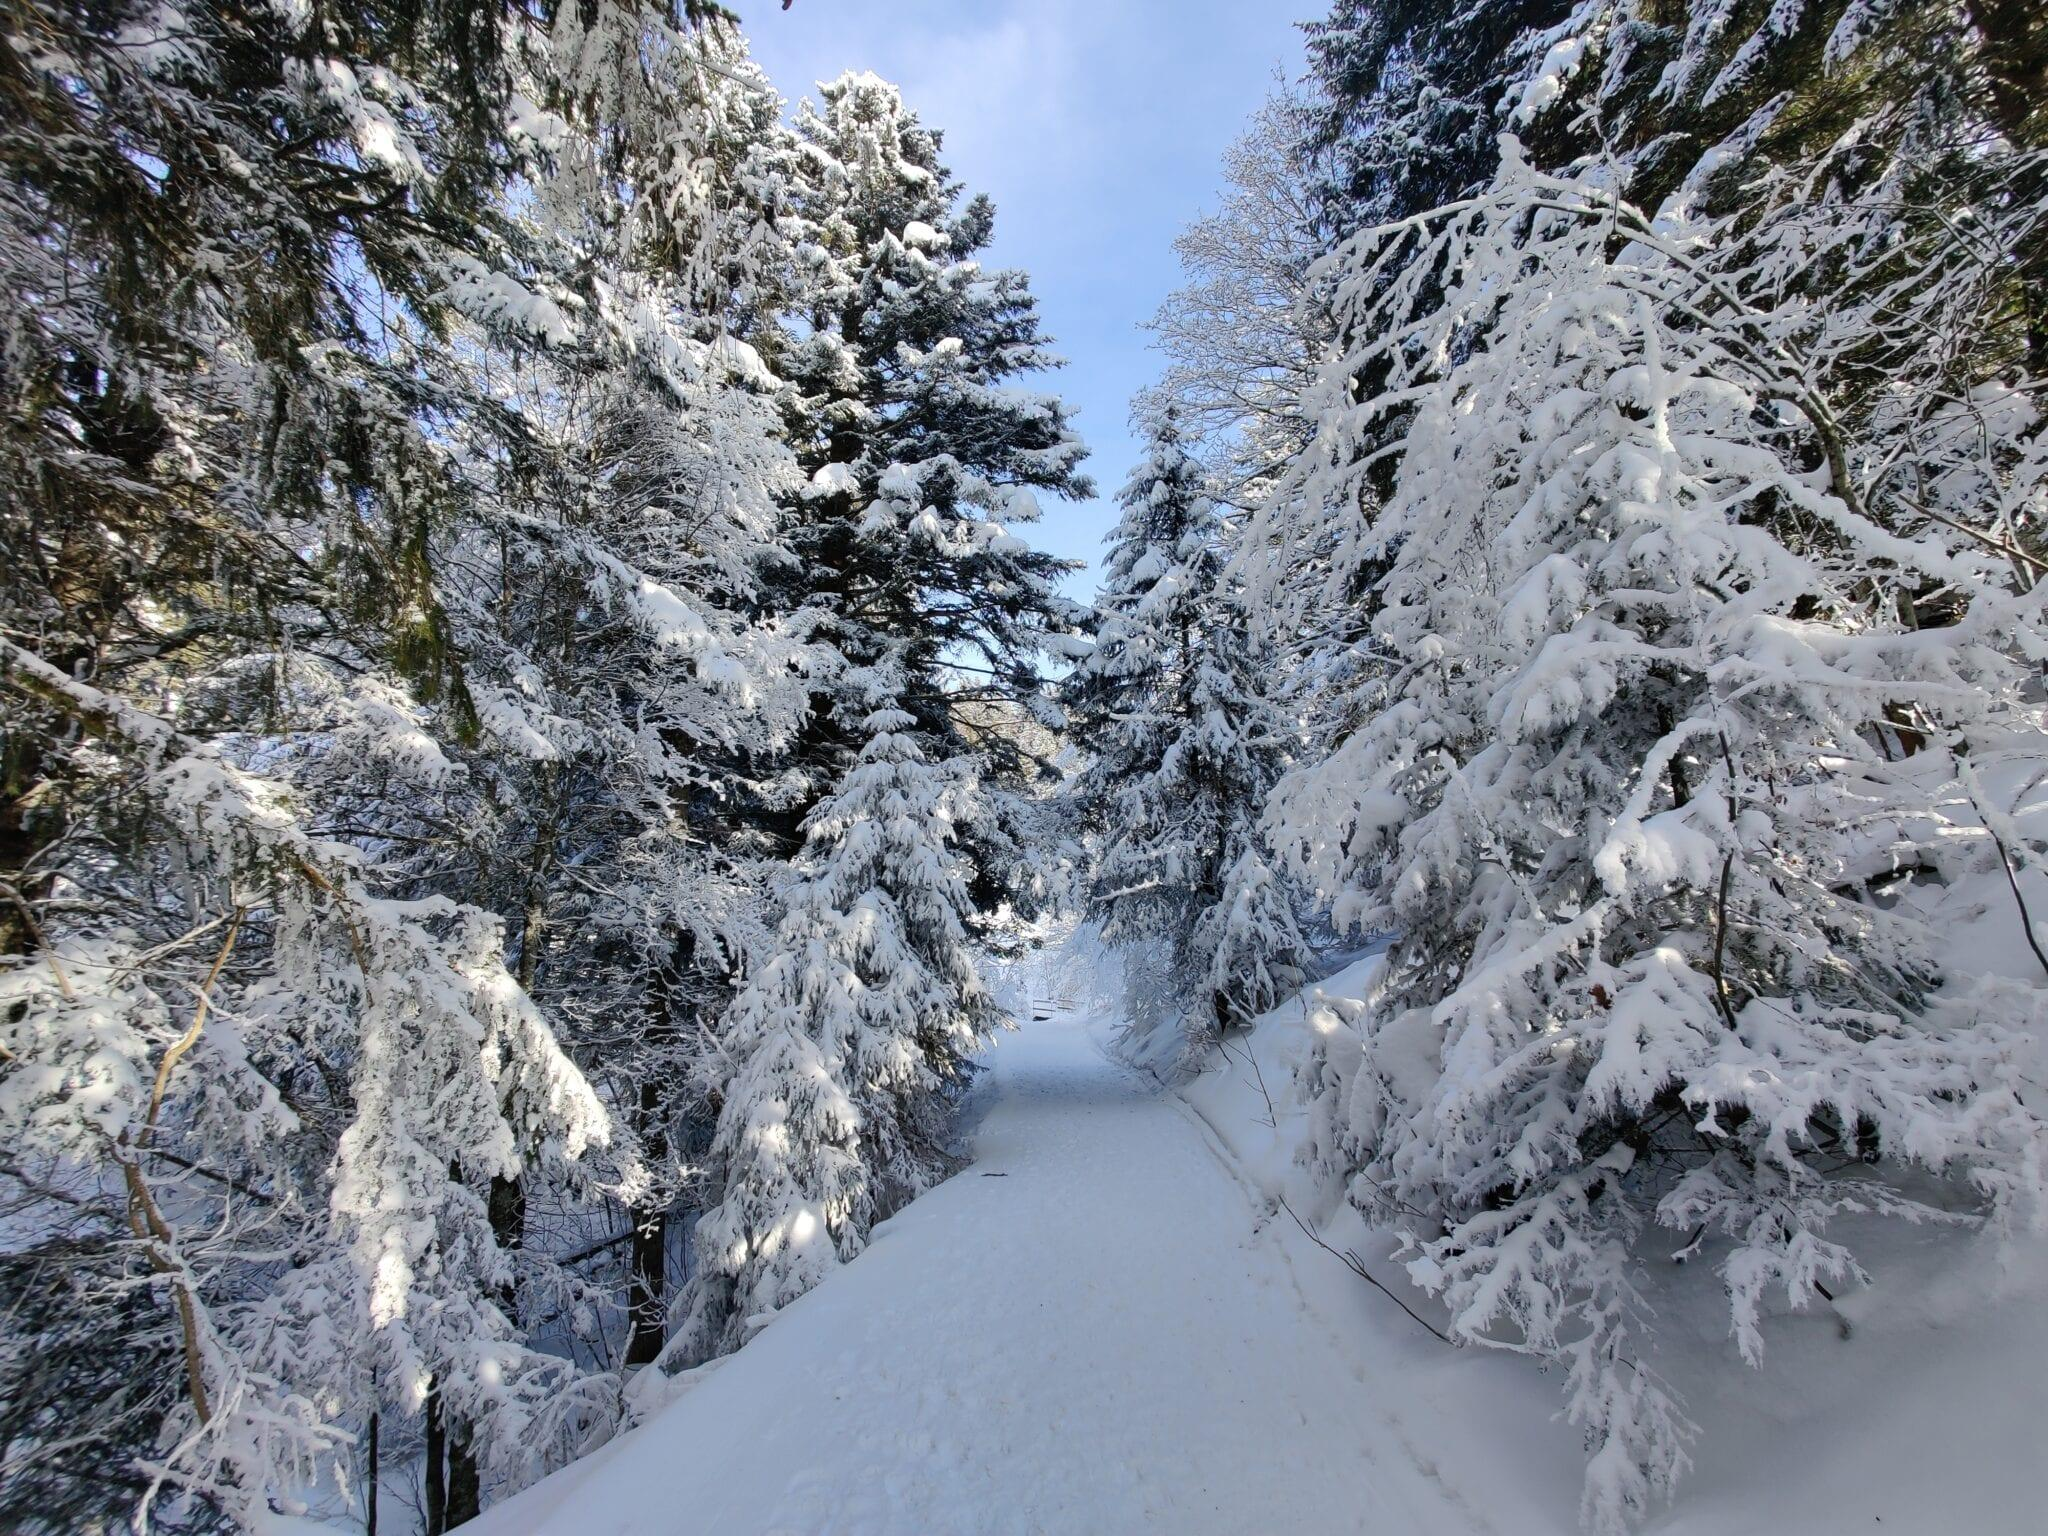 Schneeschuhrundwanderung Illgau – Ibergeregg